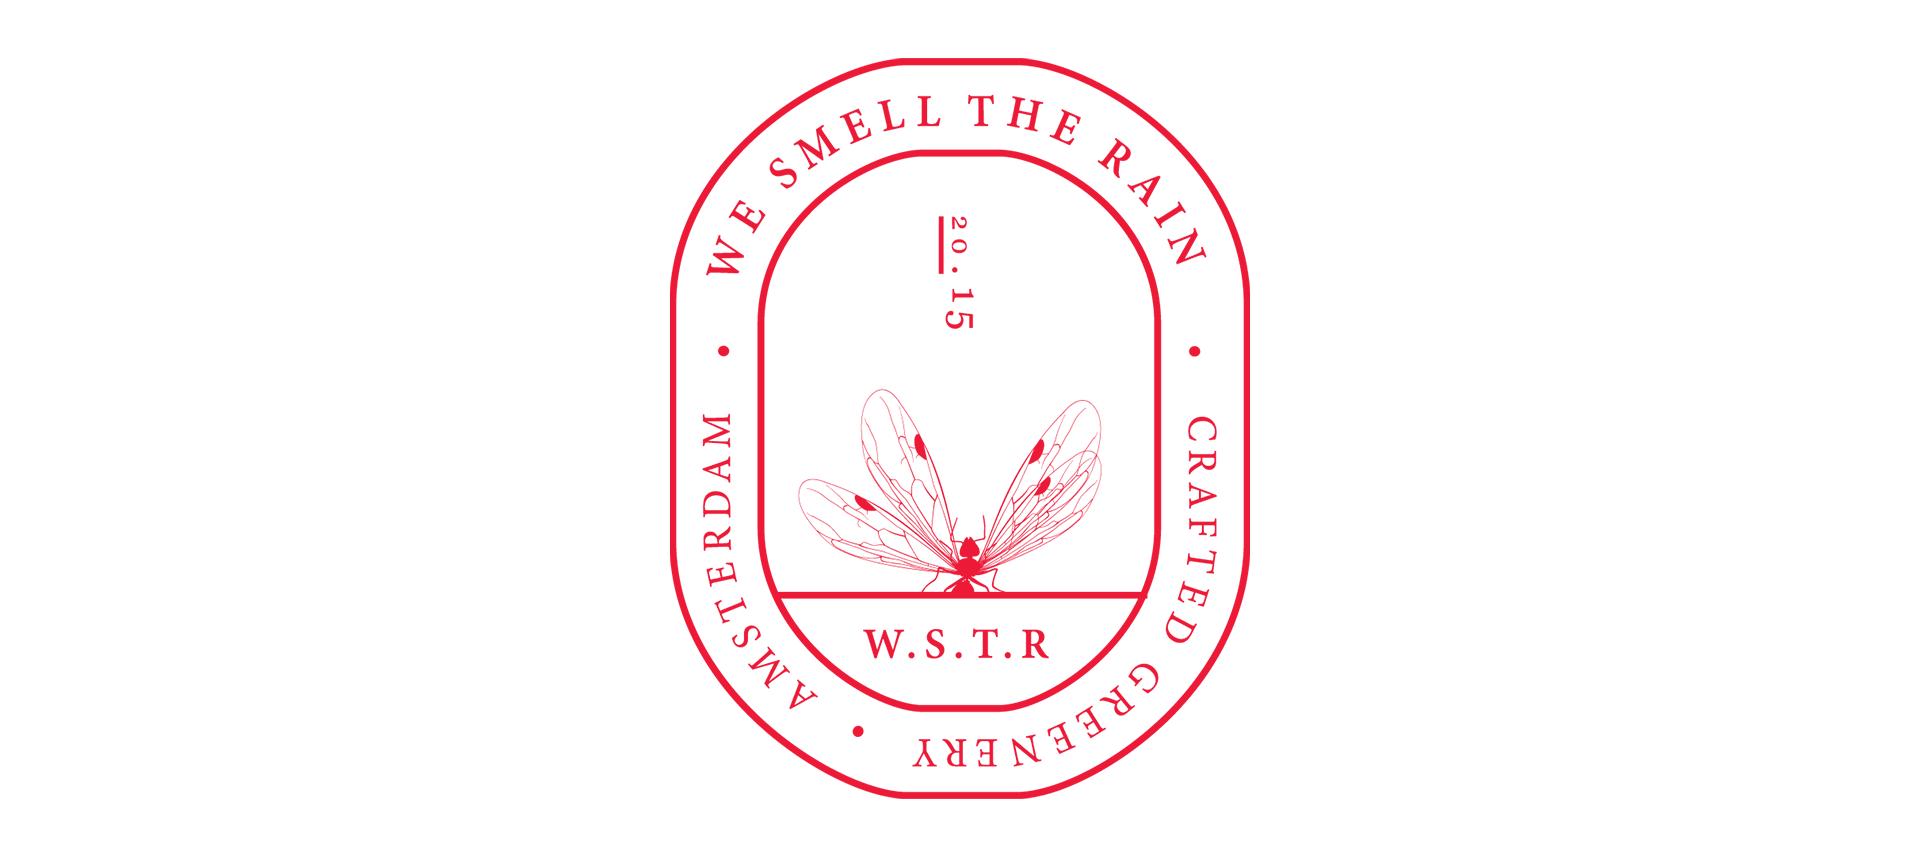 WSTR-LOGO-round-Full-width-image-1